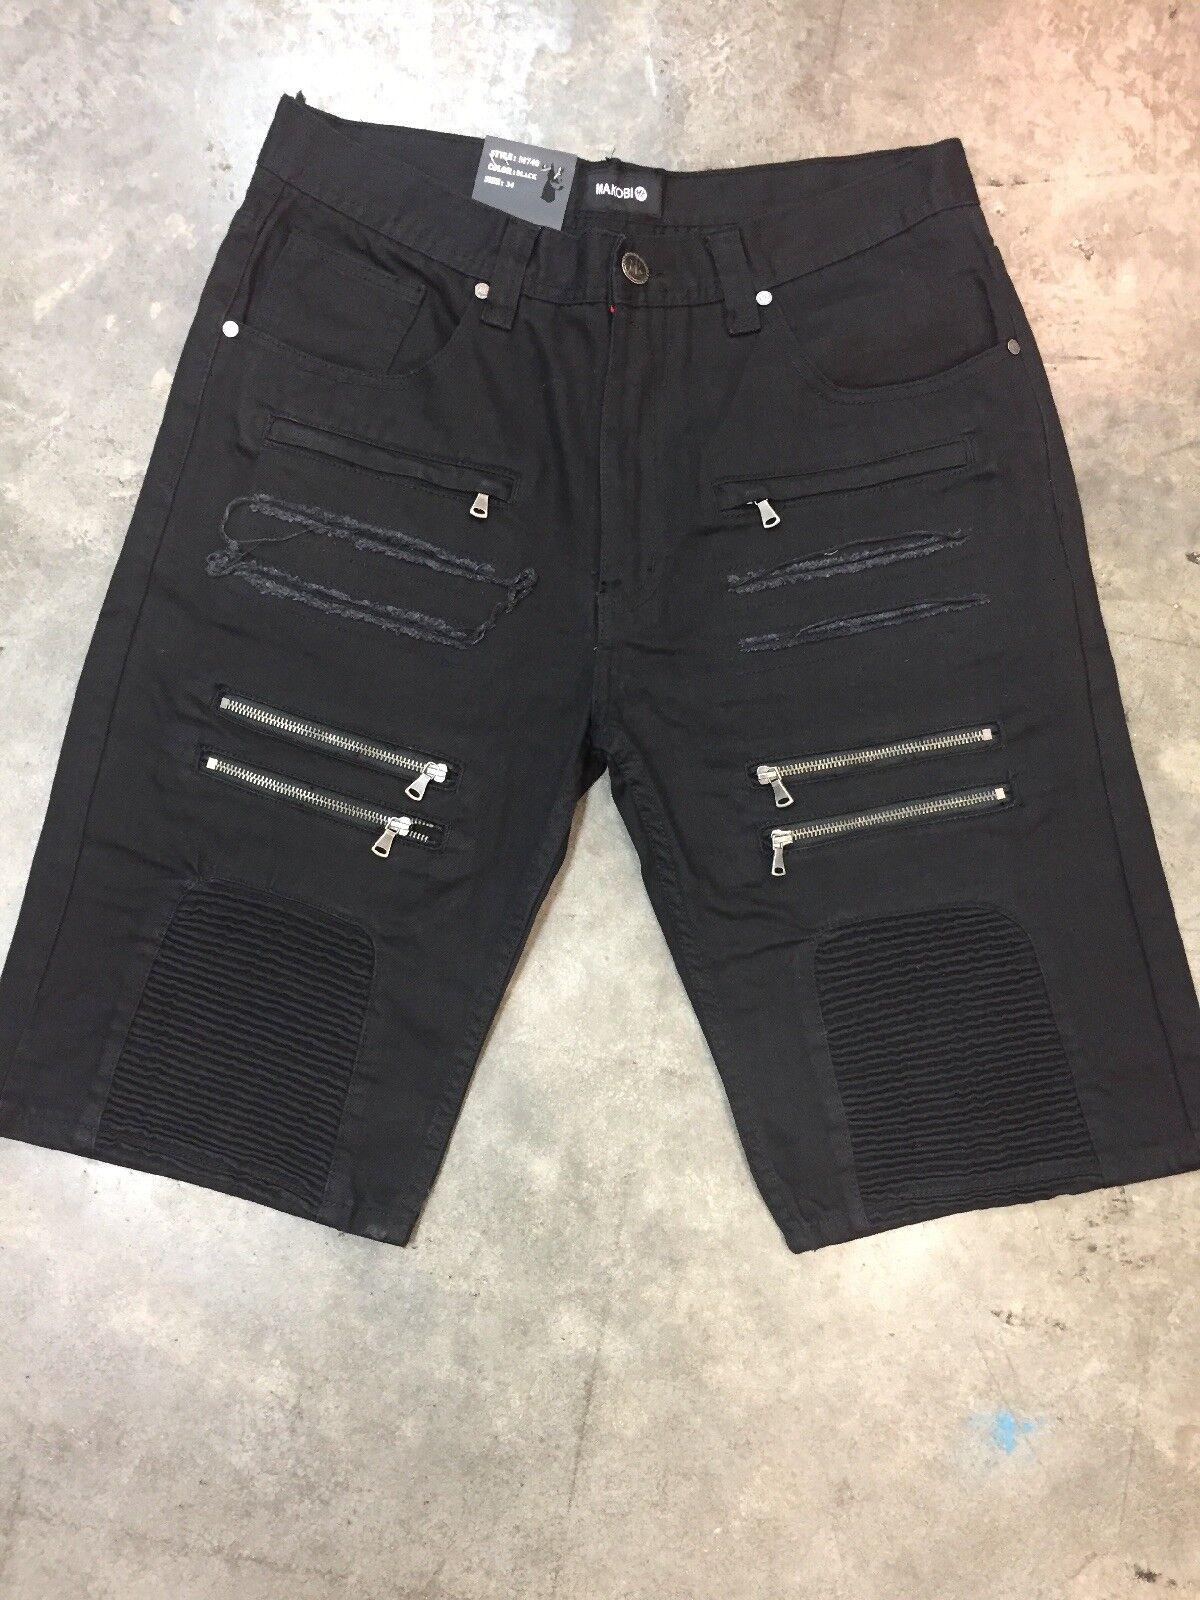 Makobi shorts , Biker Shorts